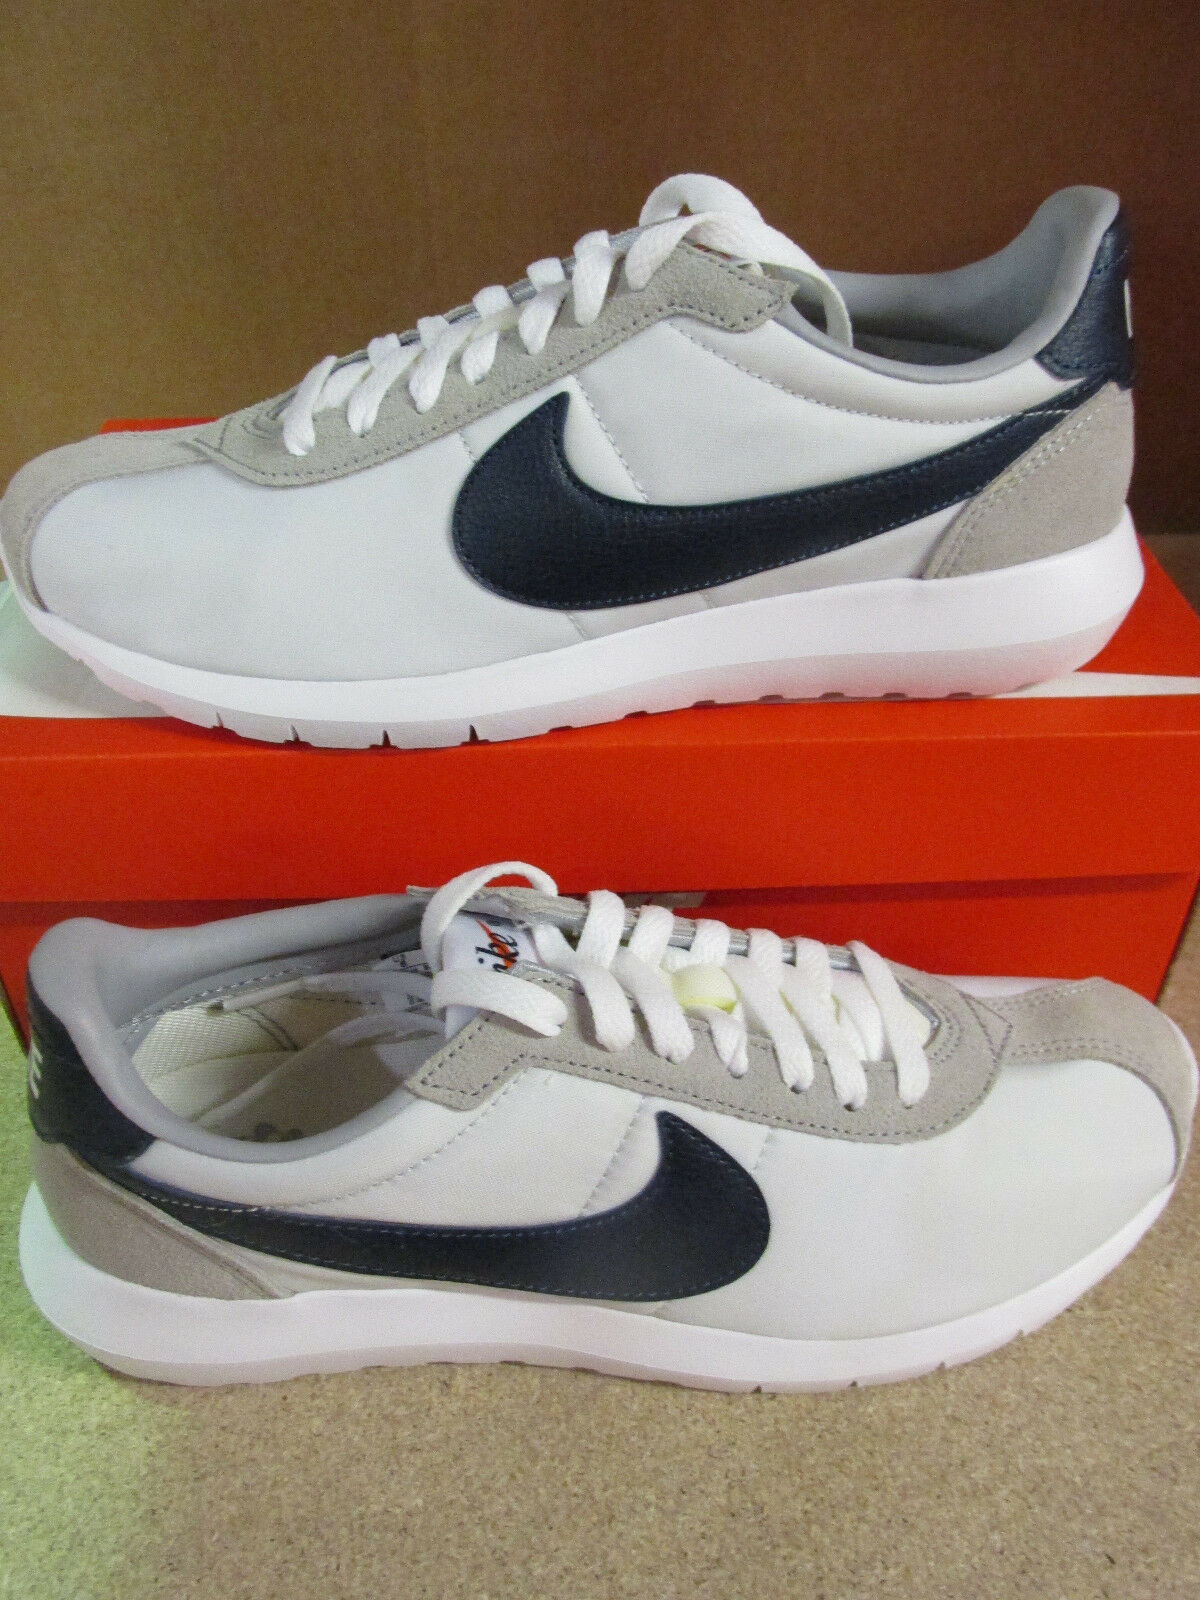 nike roshe 802022 LD-1000 QS mens trainers 802022 roshe 002 sneakers shoes ead6d7